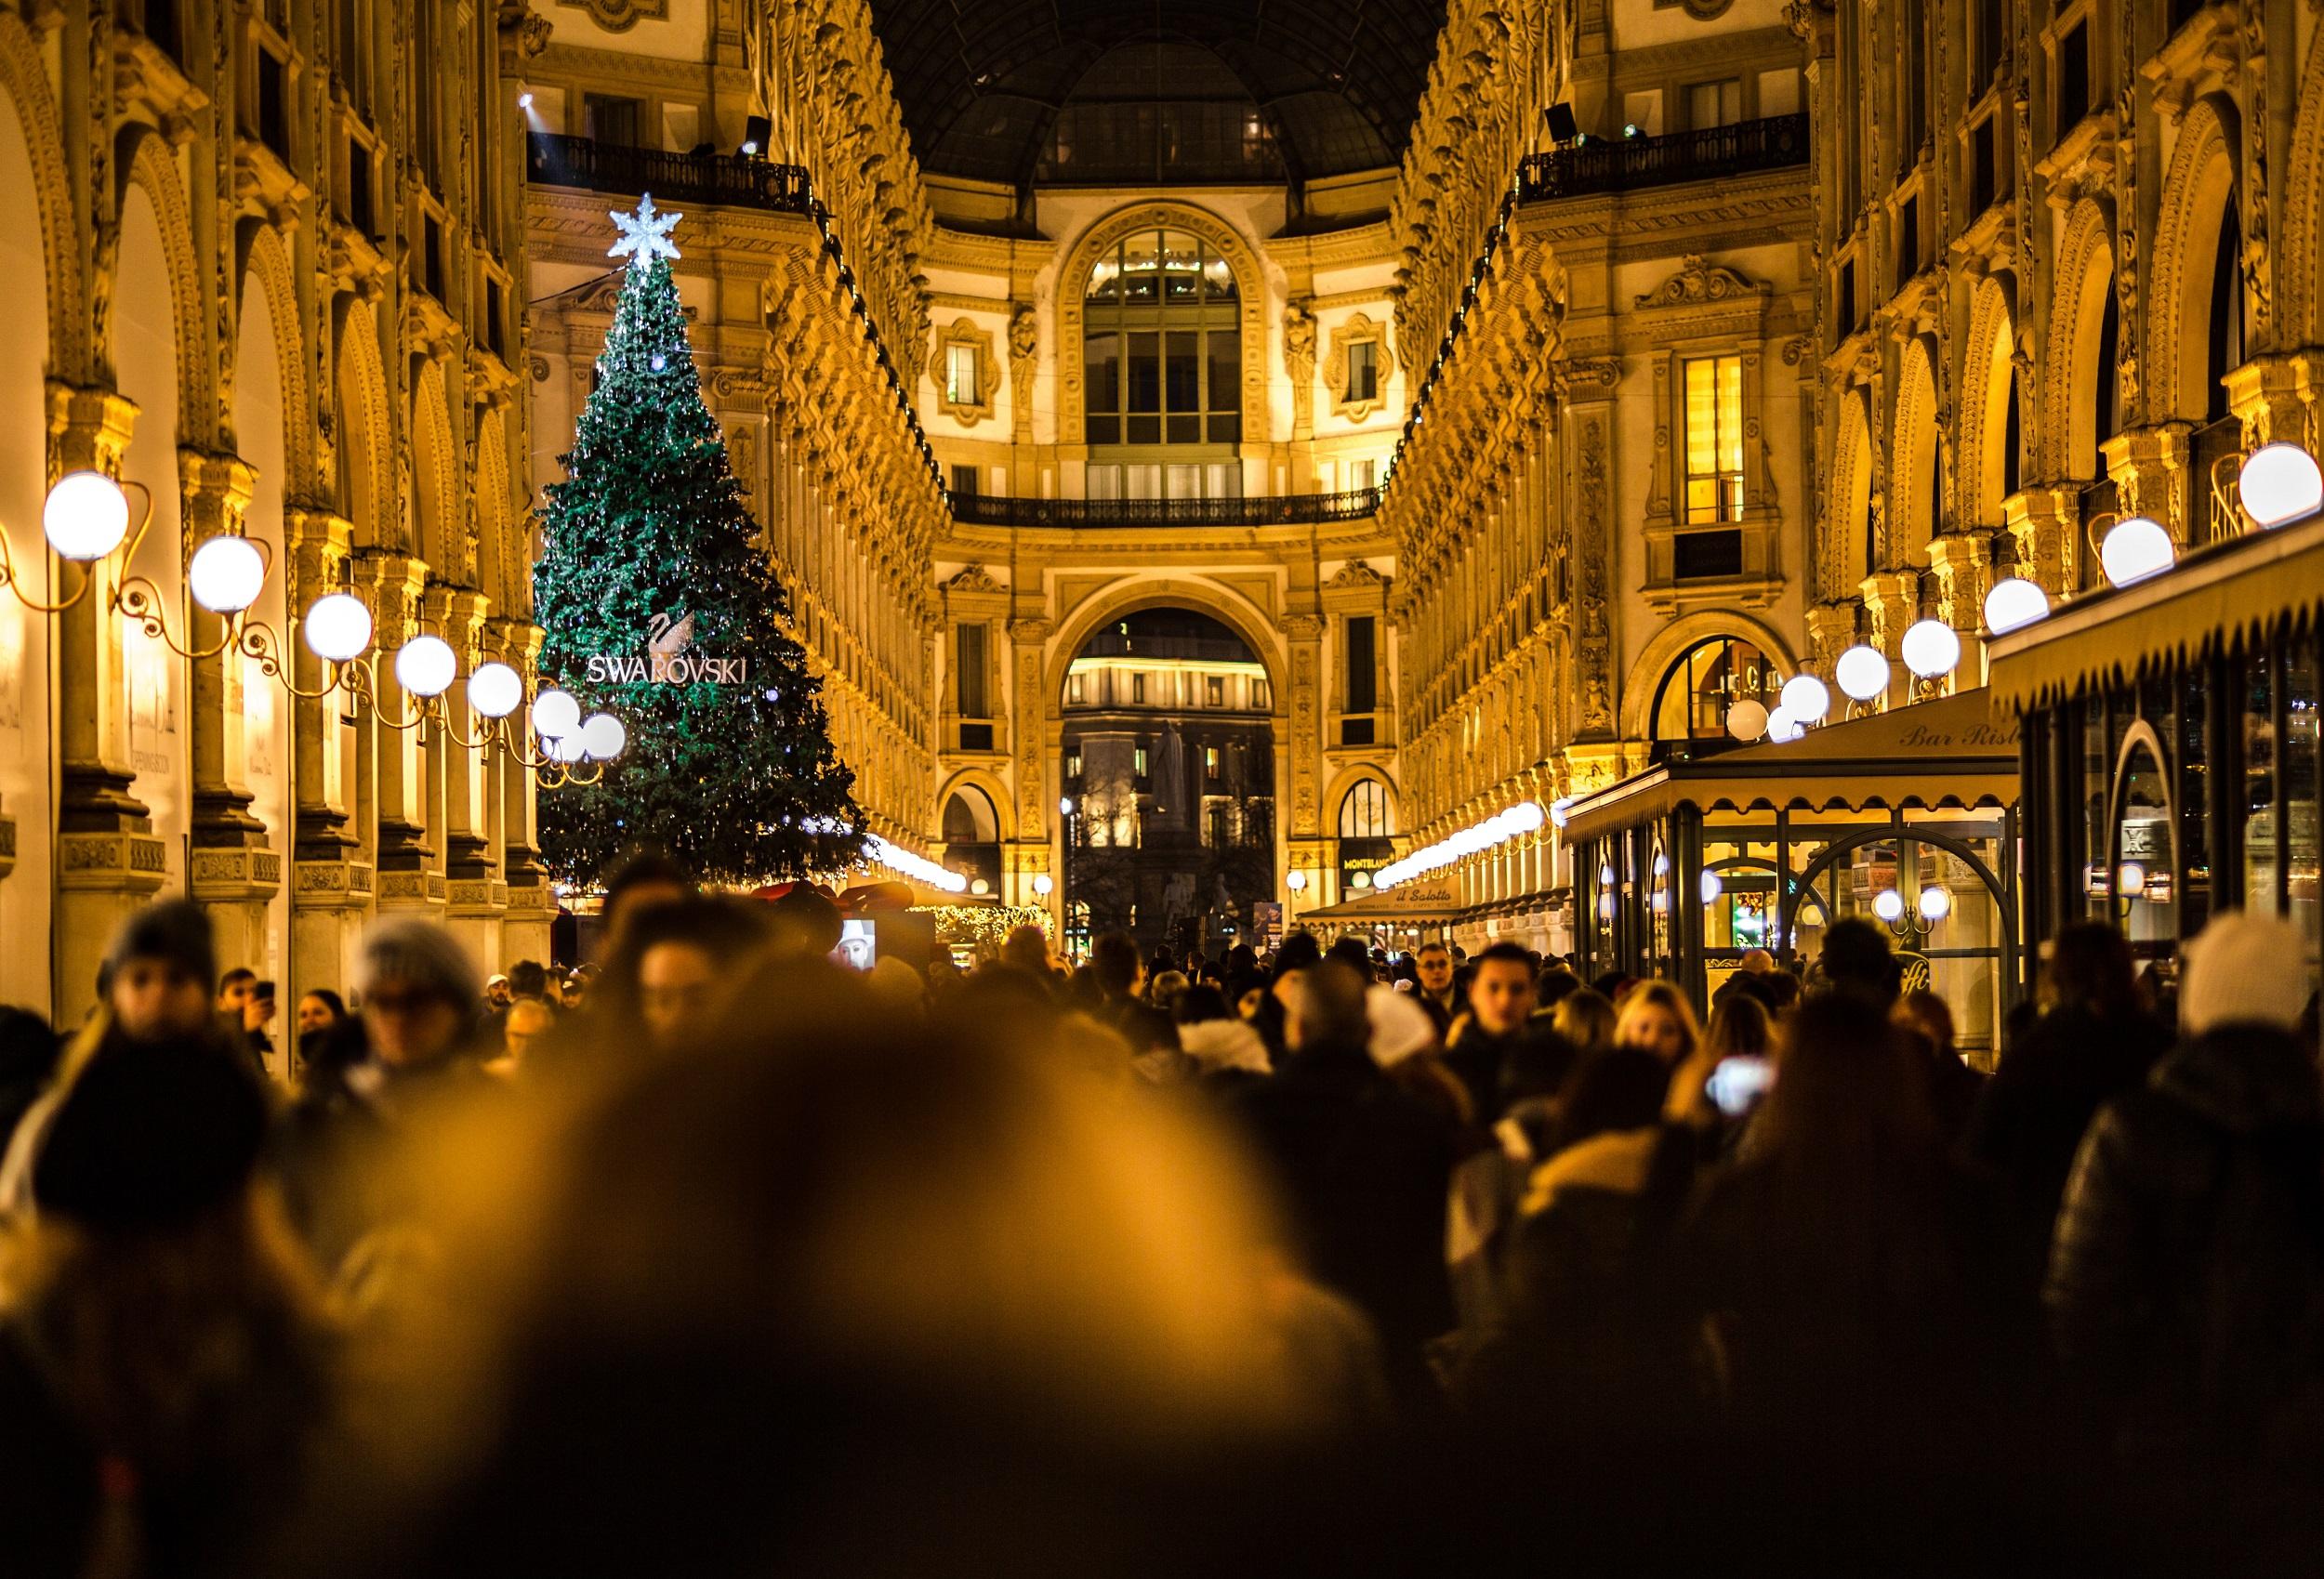 Milan, Italy during Christmas